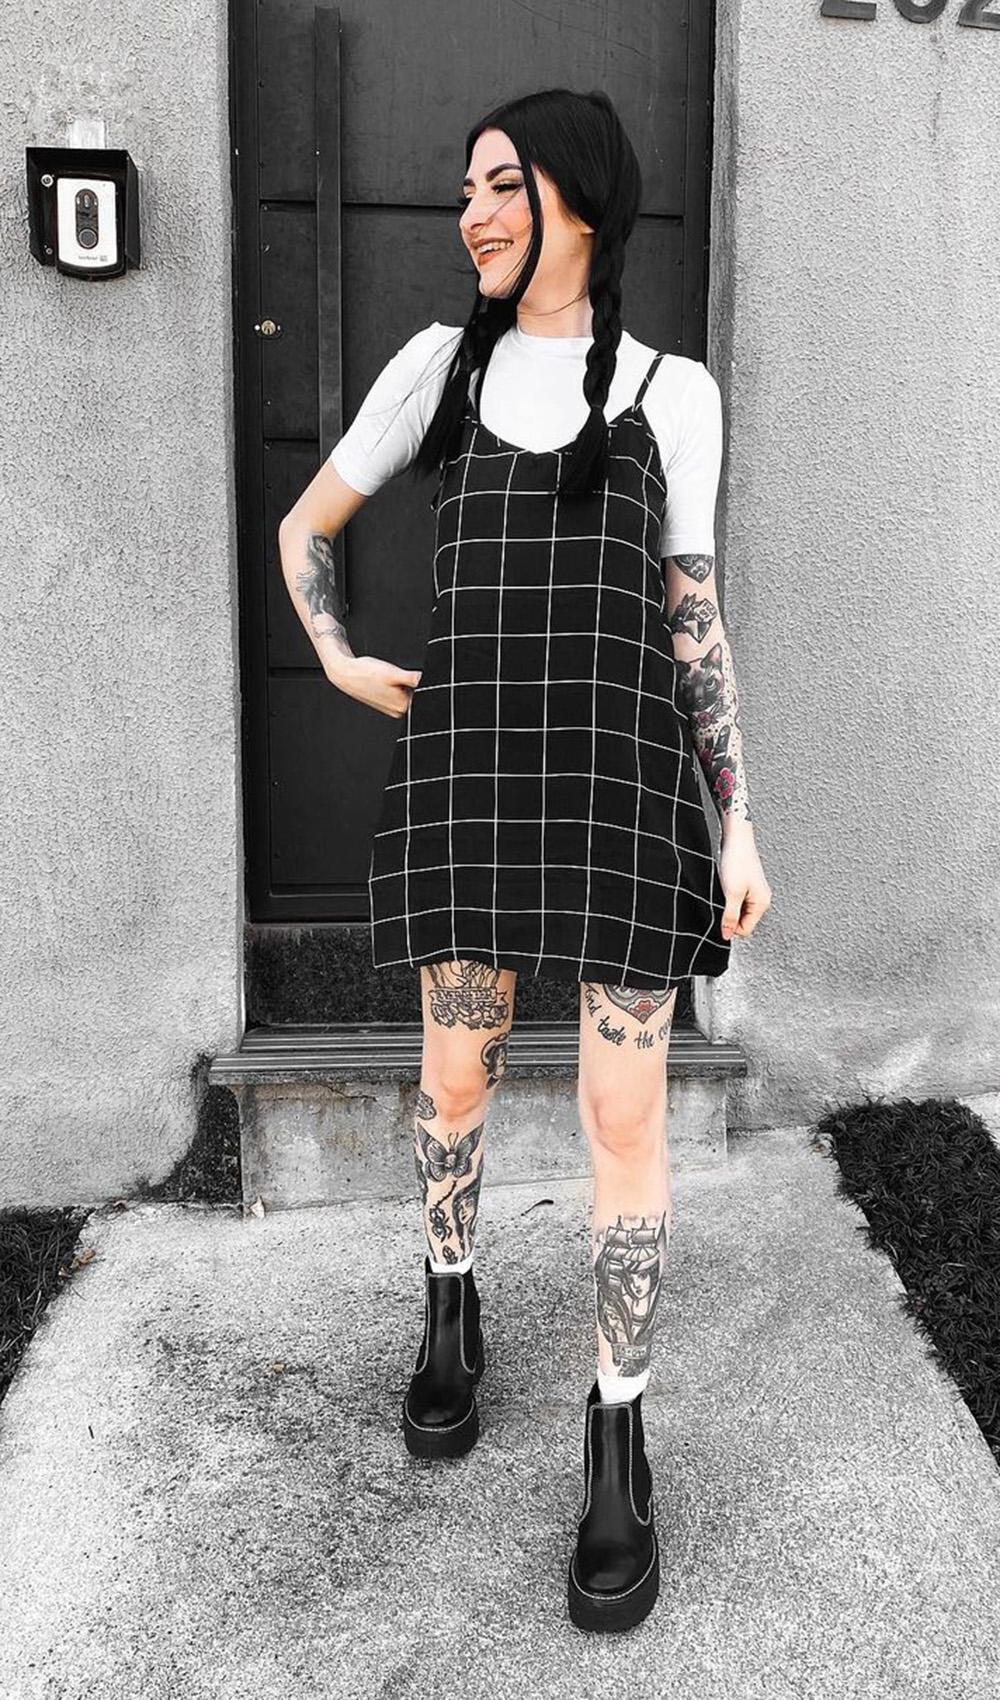 Letícia Vasconcelos, vestido xadrez preto e coturno